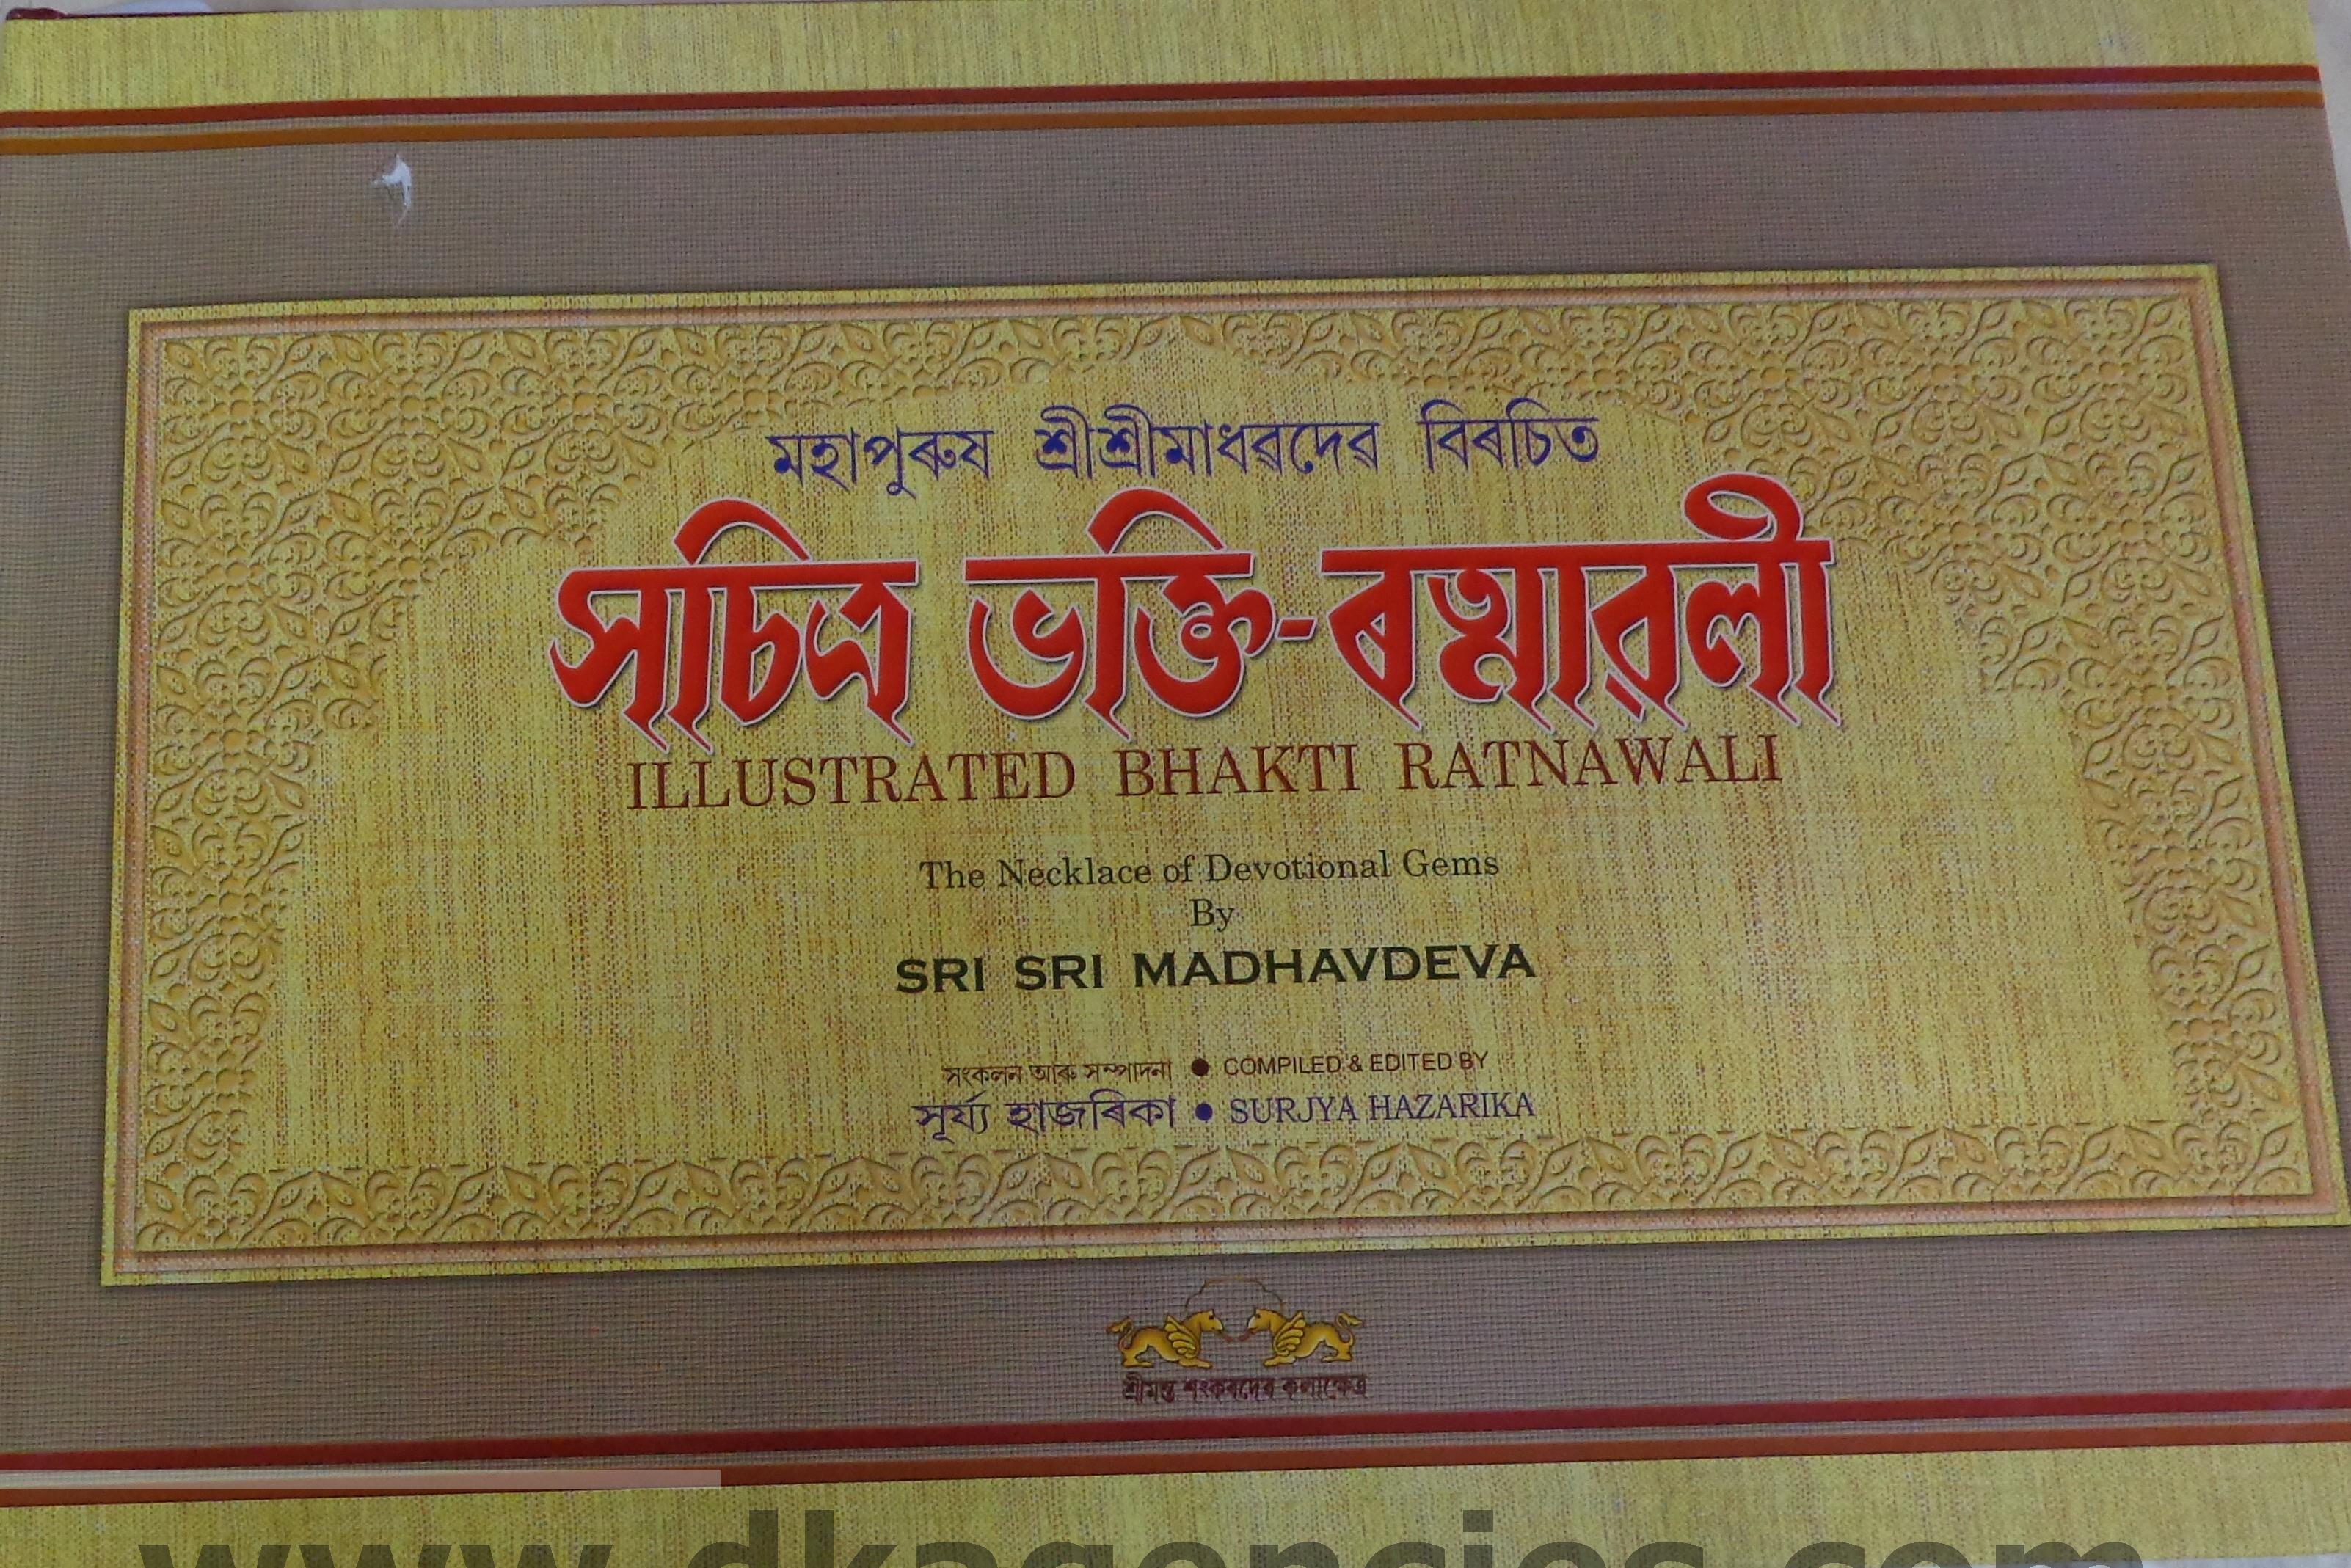 Sacitra Bhakti-ratnawali /